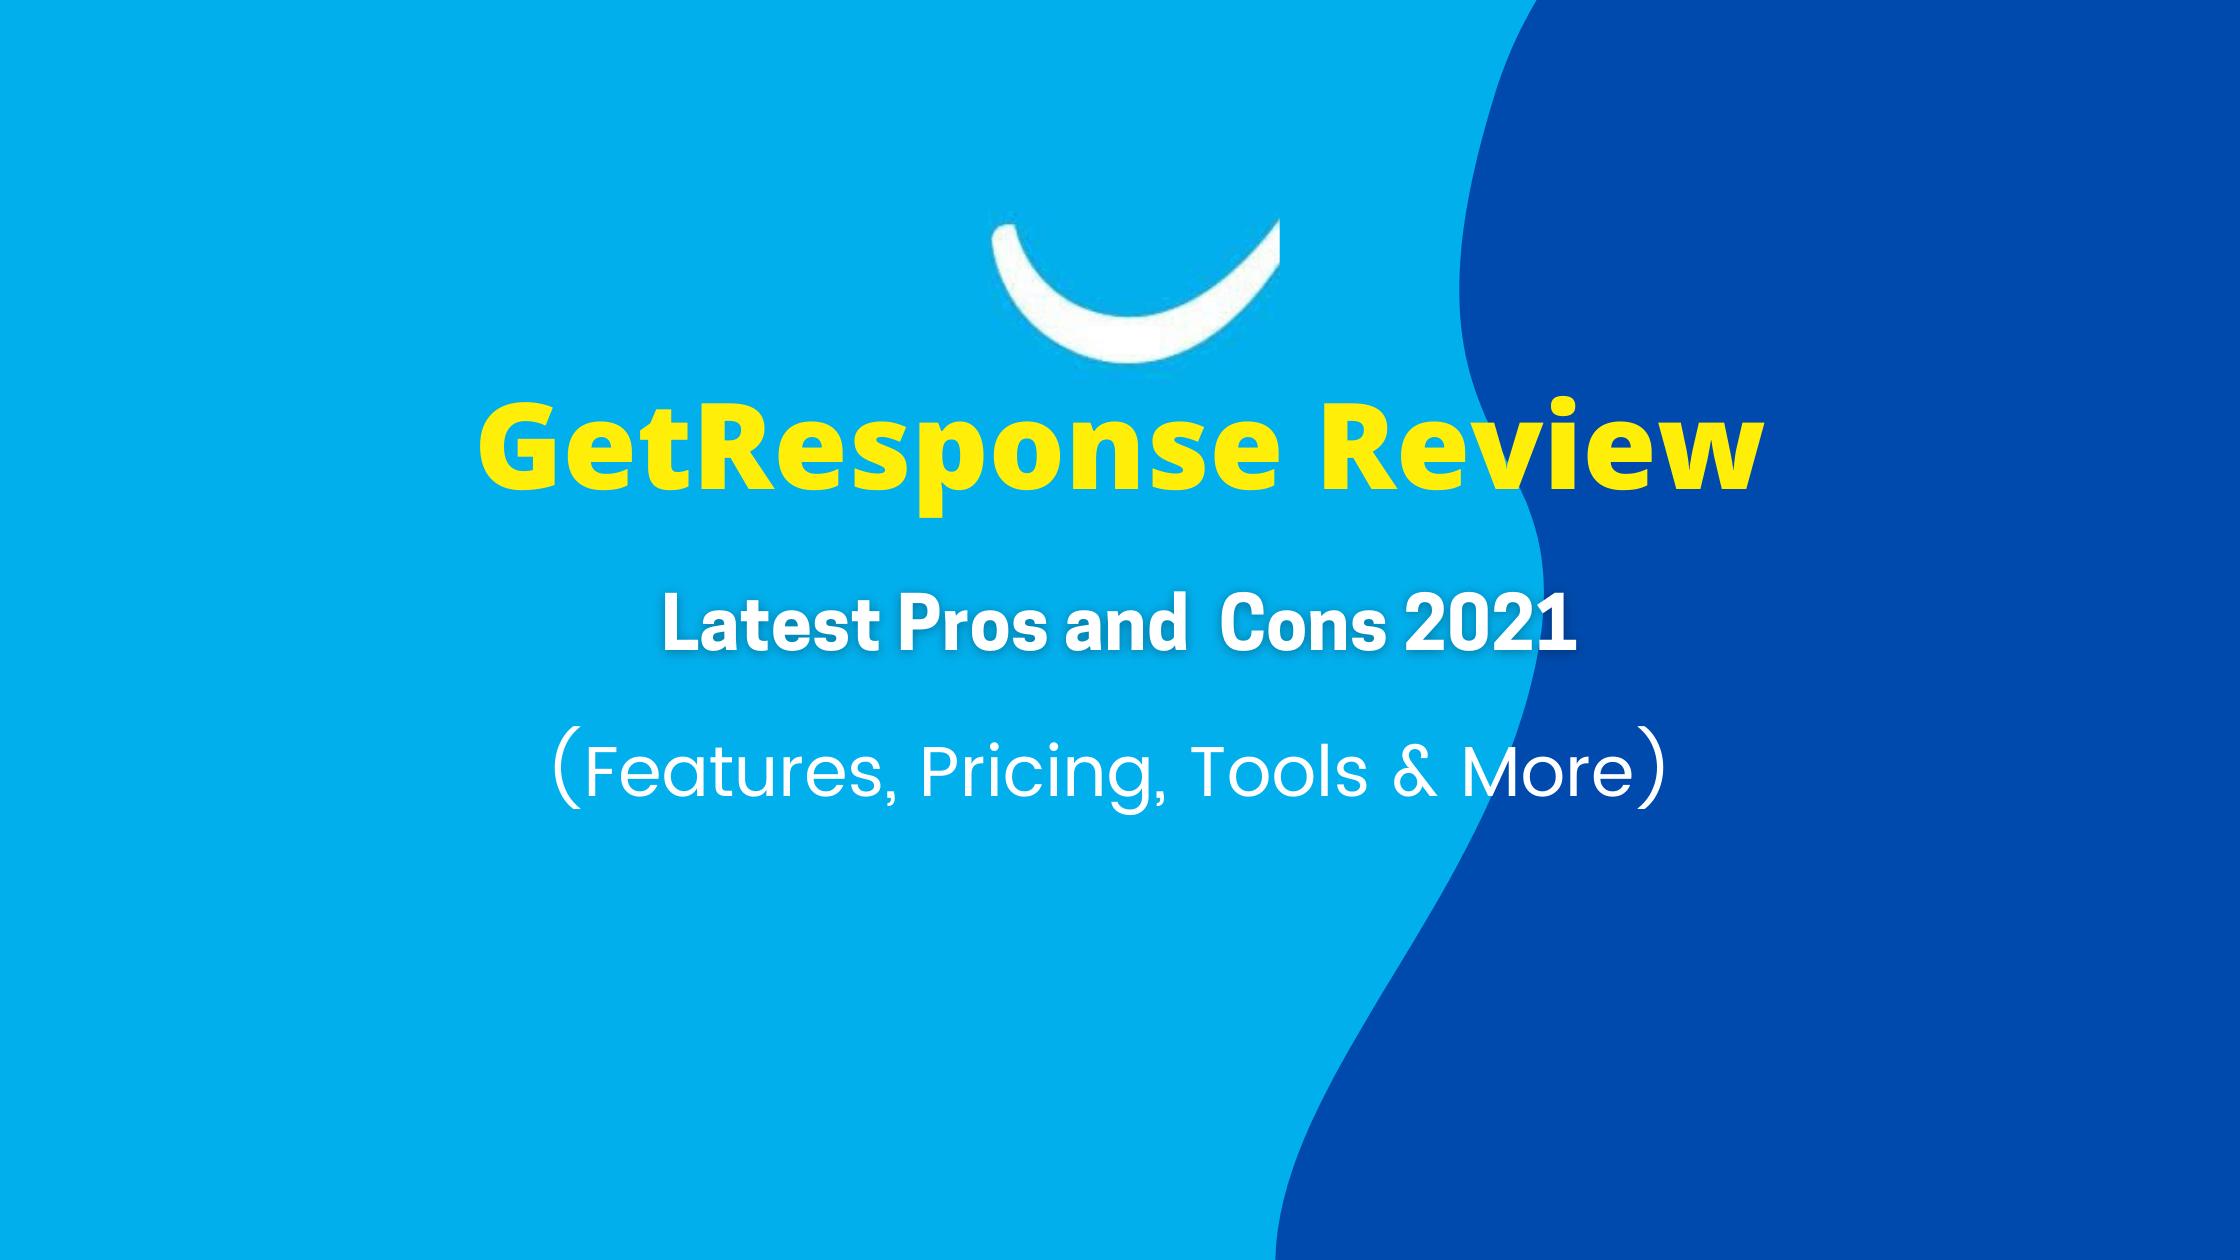 GetResponse- Pros & Cons Latest 2021